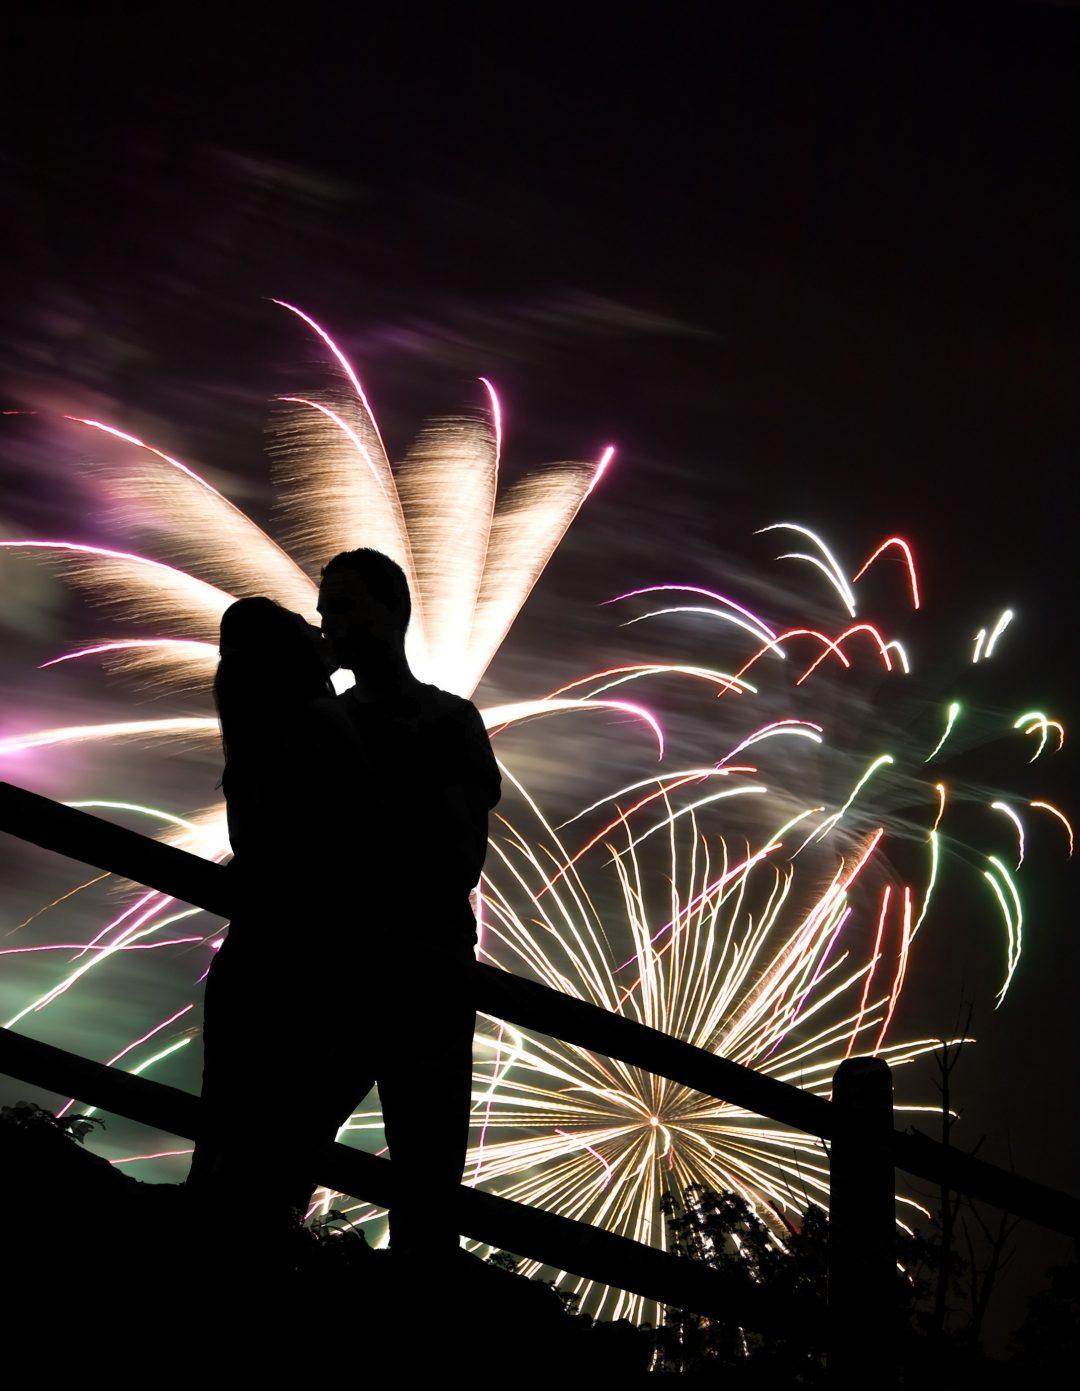 winter-wedding-proposal-ideas-firework-display